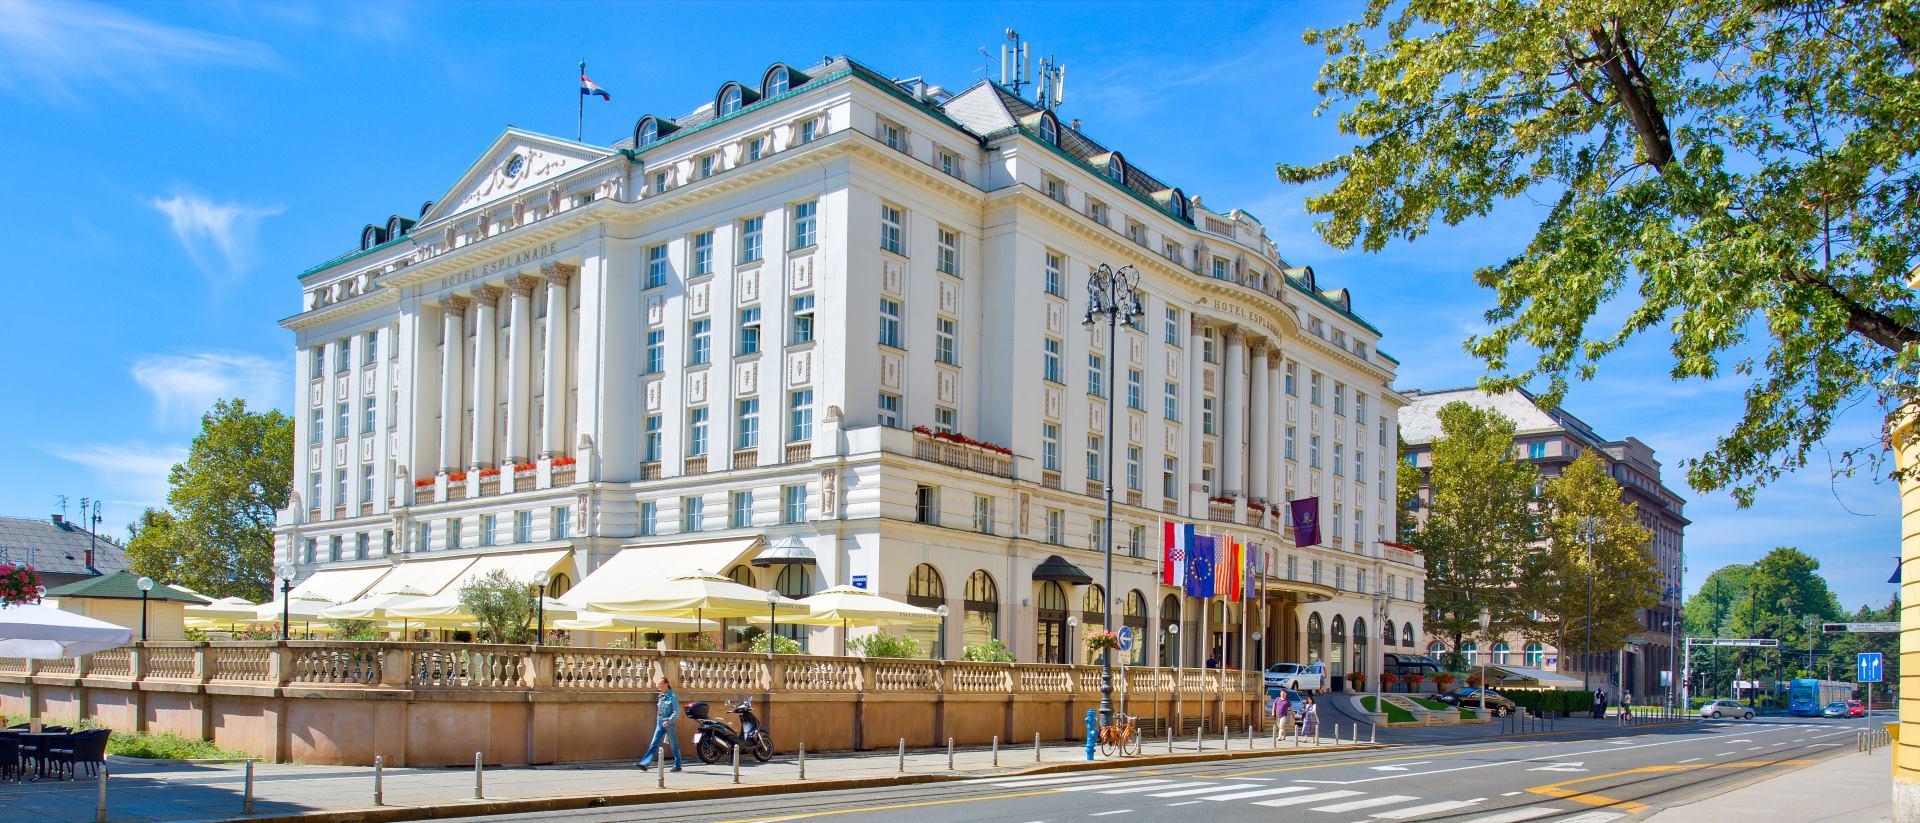 Riznica nagrada hotela Esplanade obogaćena s tri nova hotelijerska Oscara